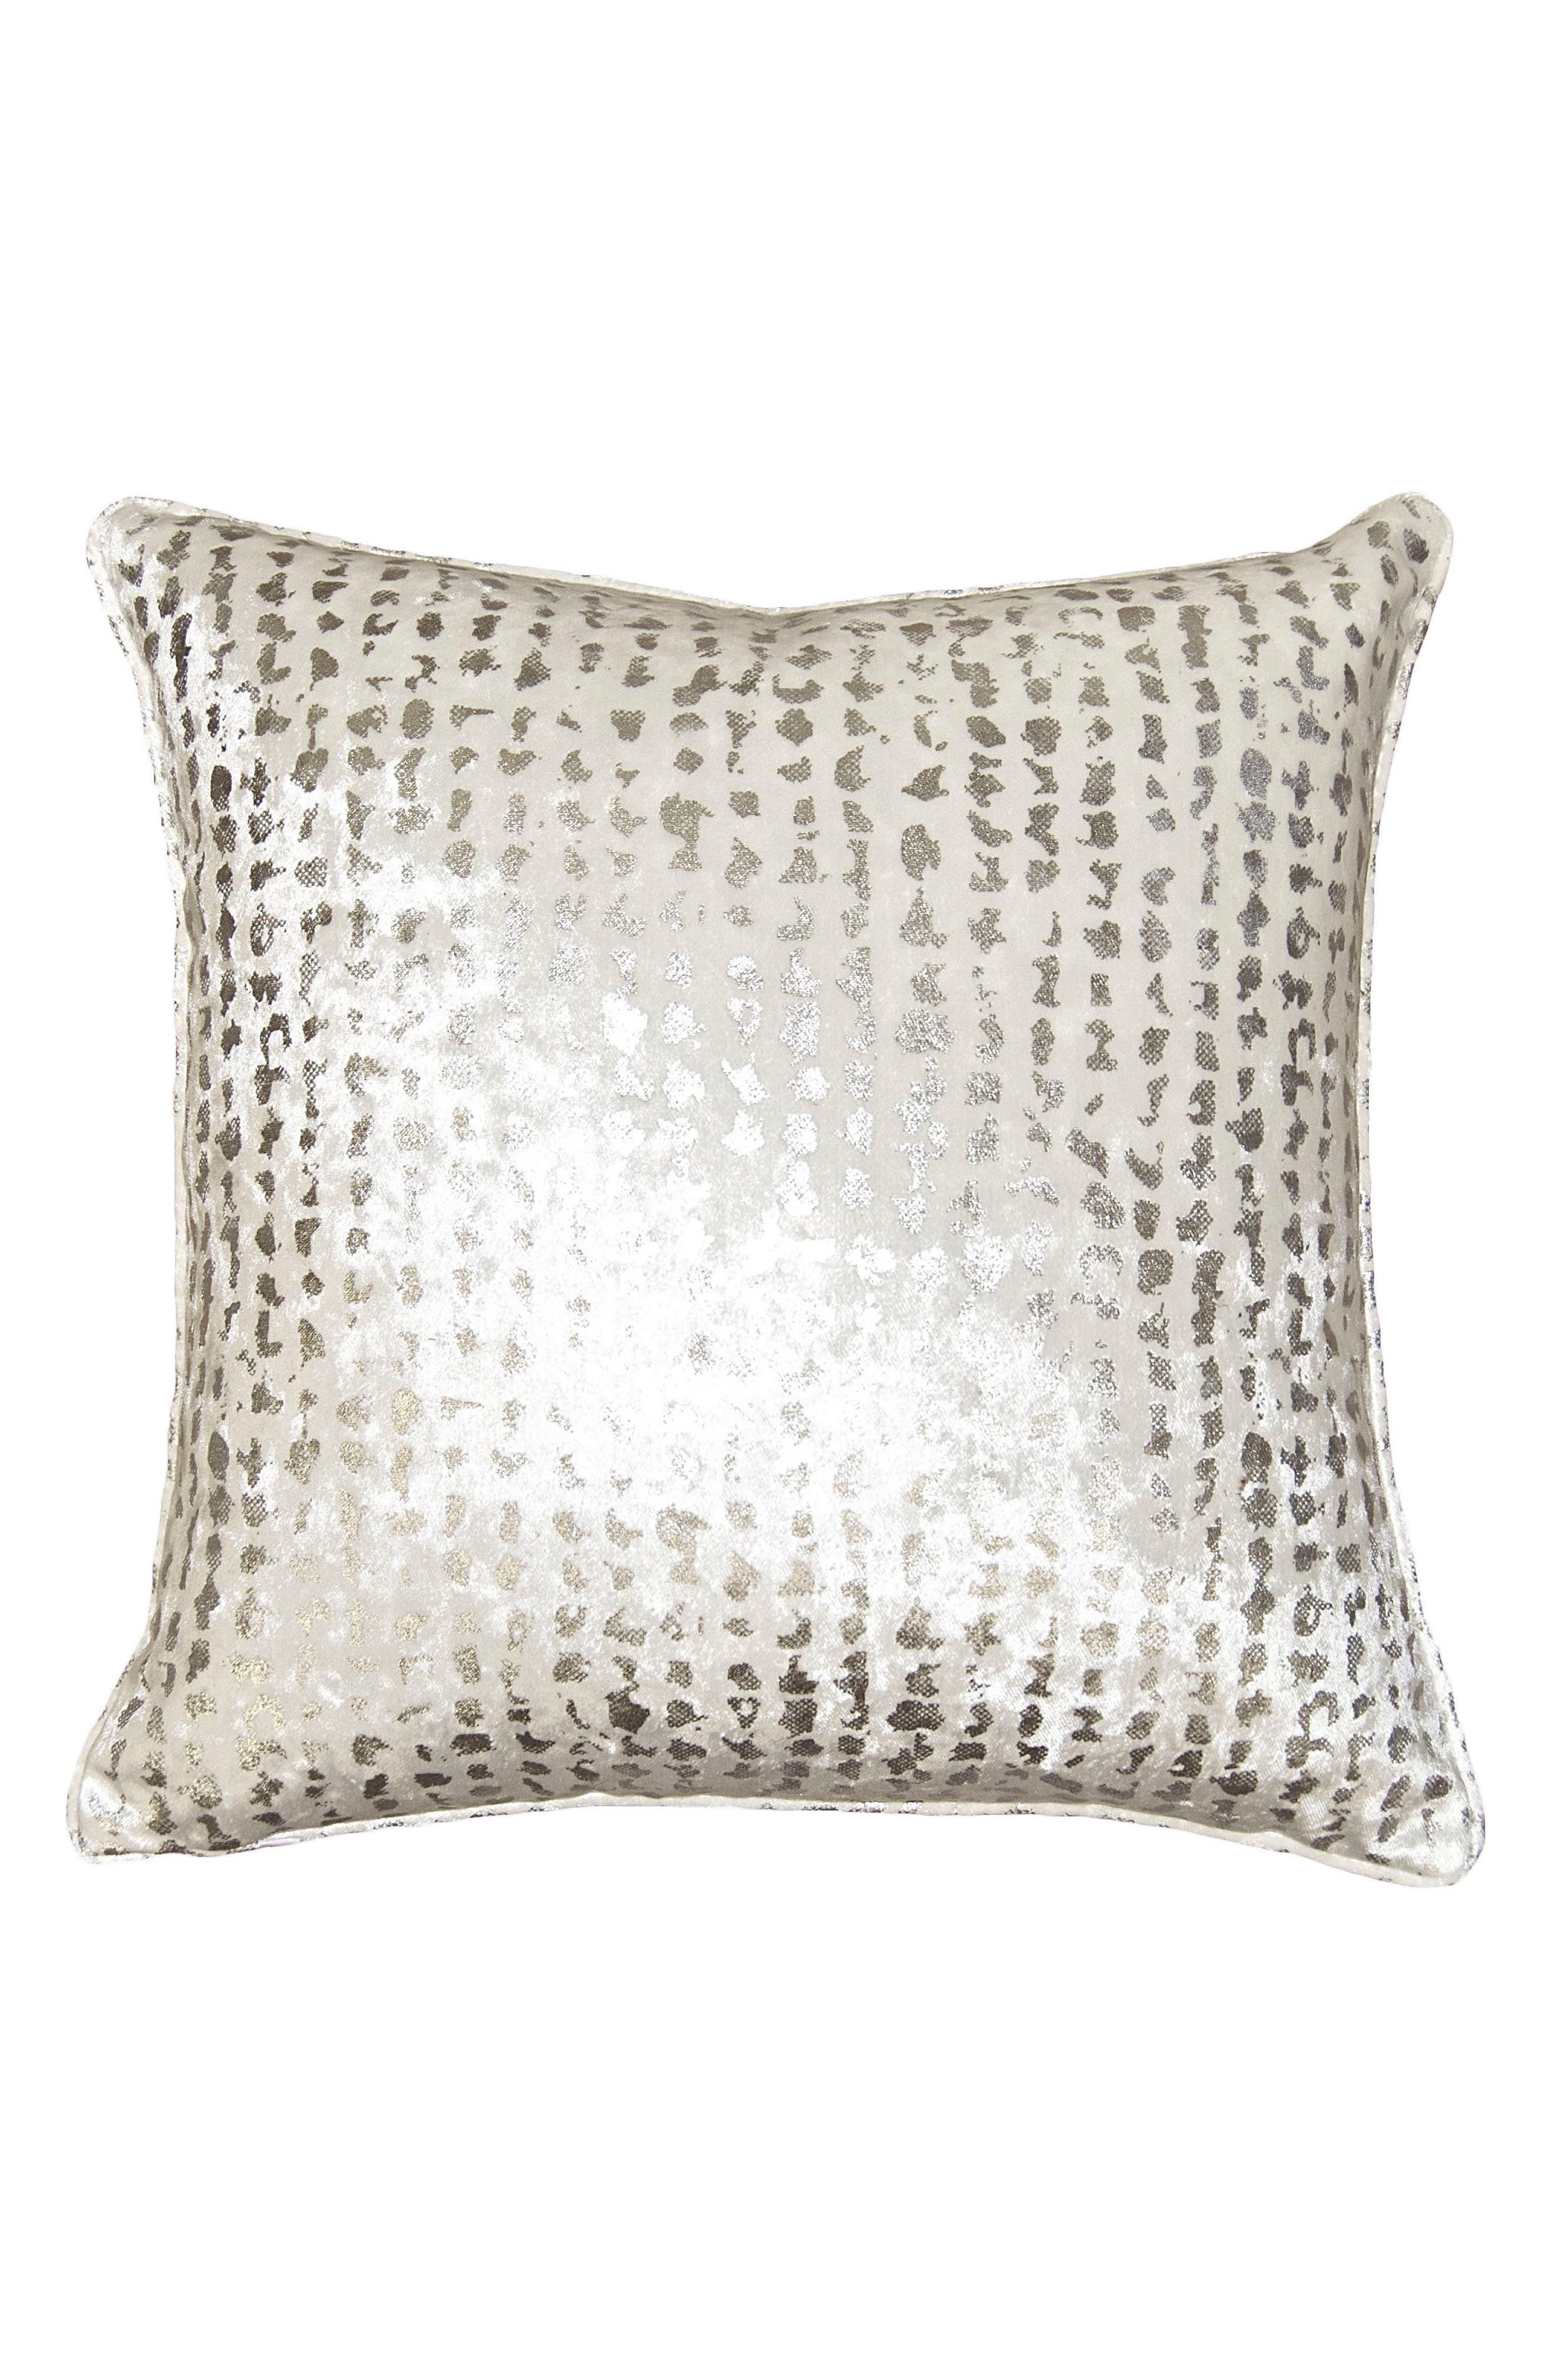 Silver Dots Accent Pillow,                             Main thumbnail 1, color,                             Silver